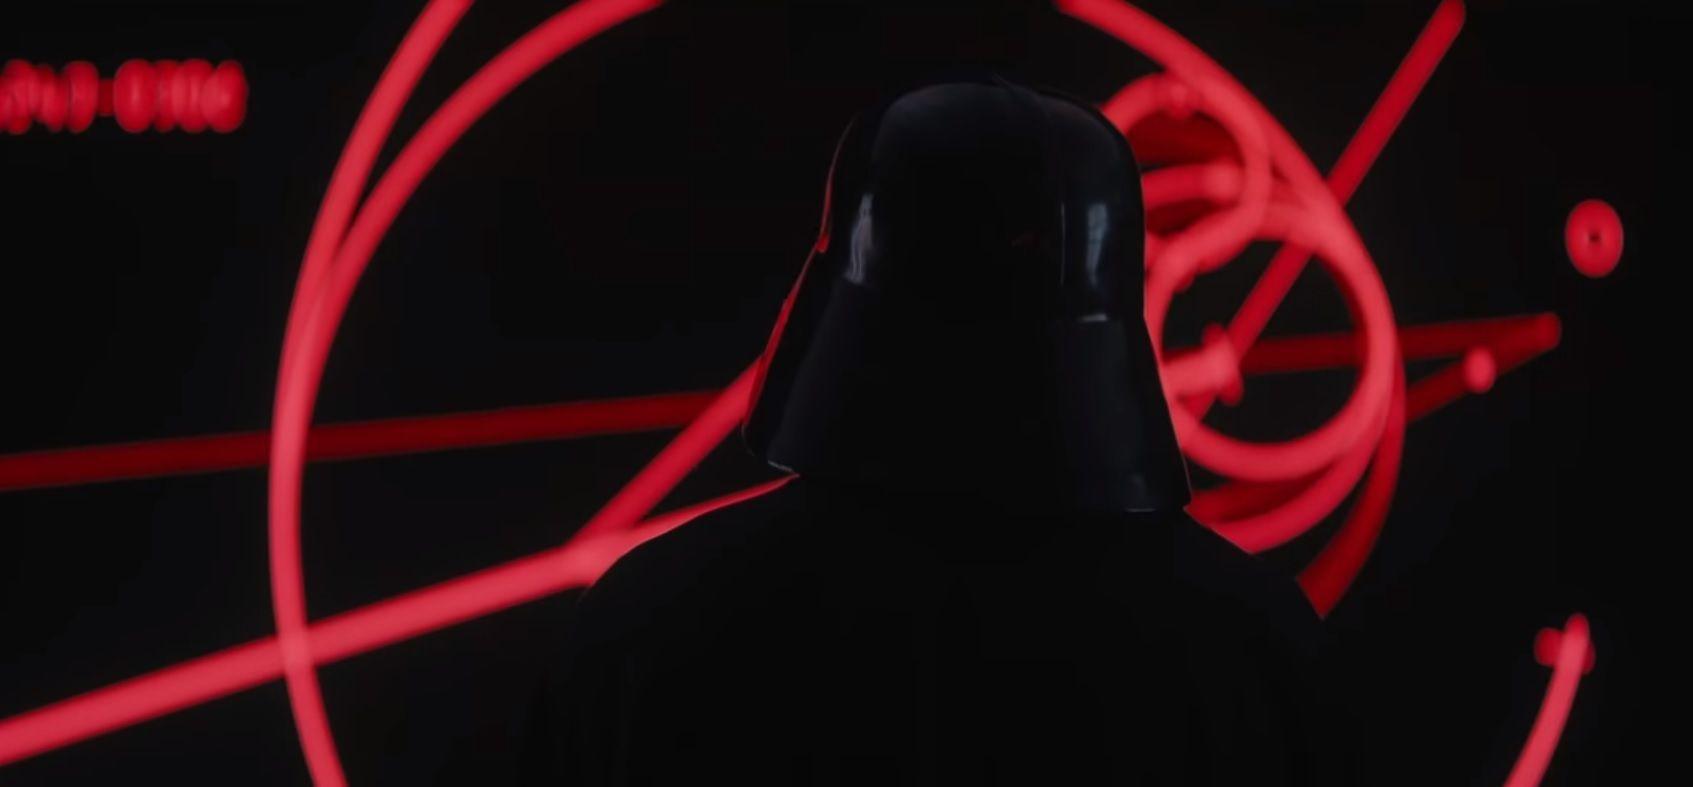 Darth Vader is back